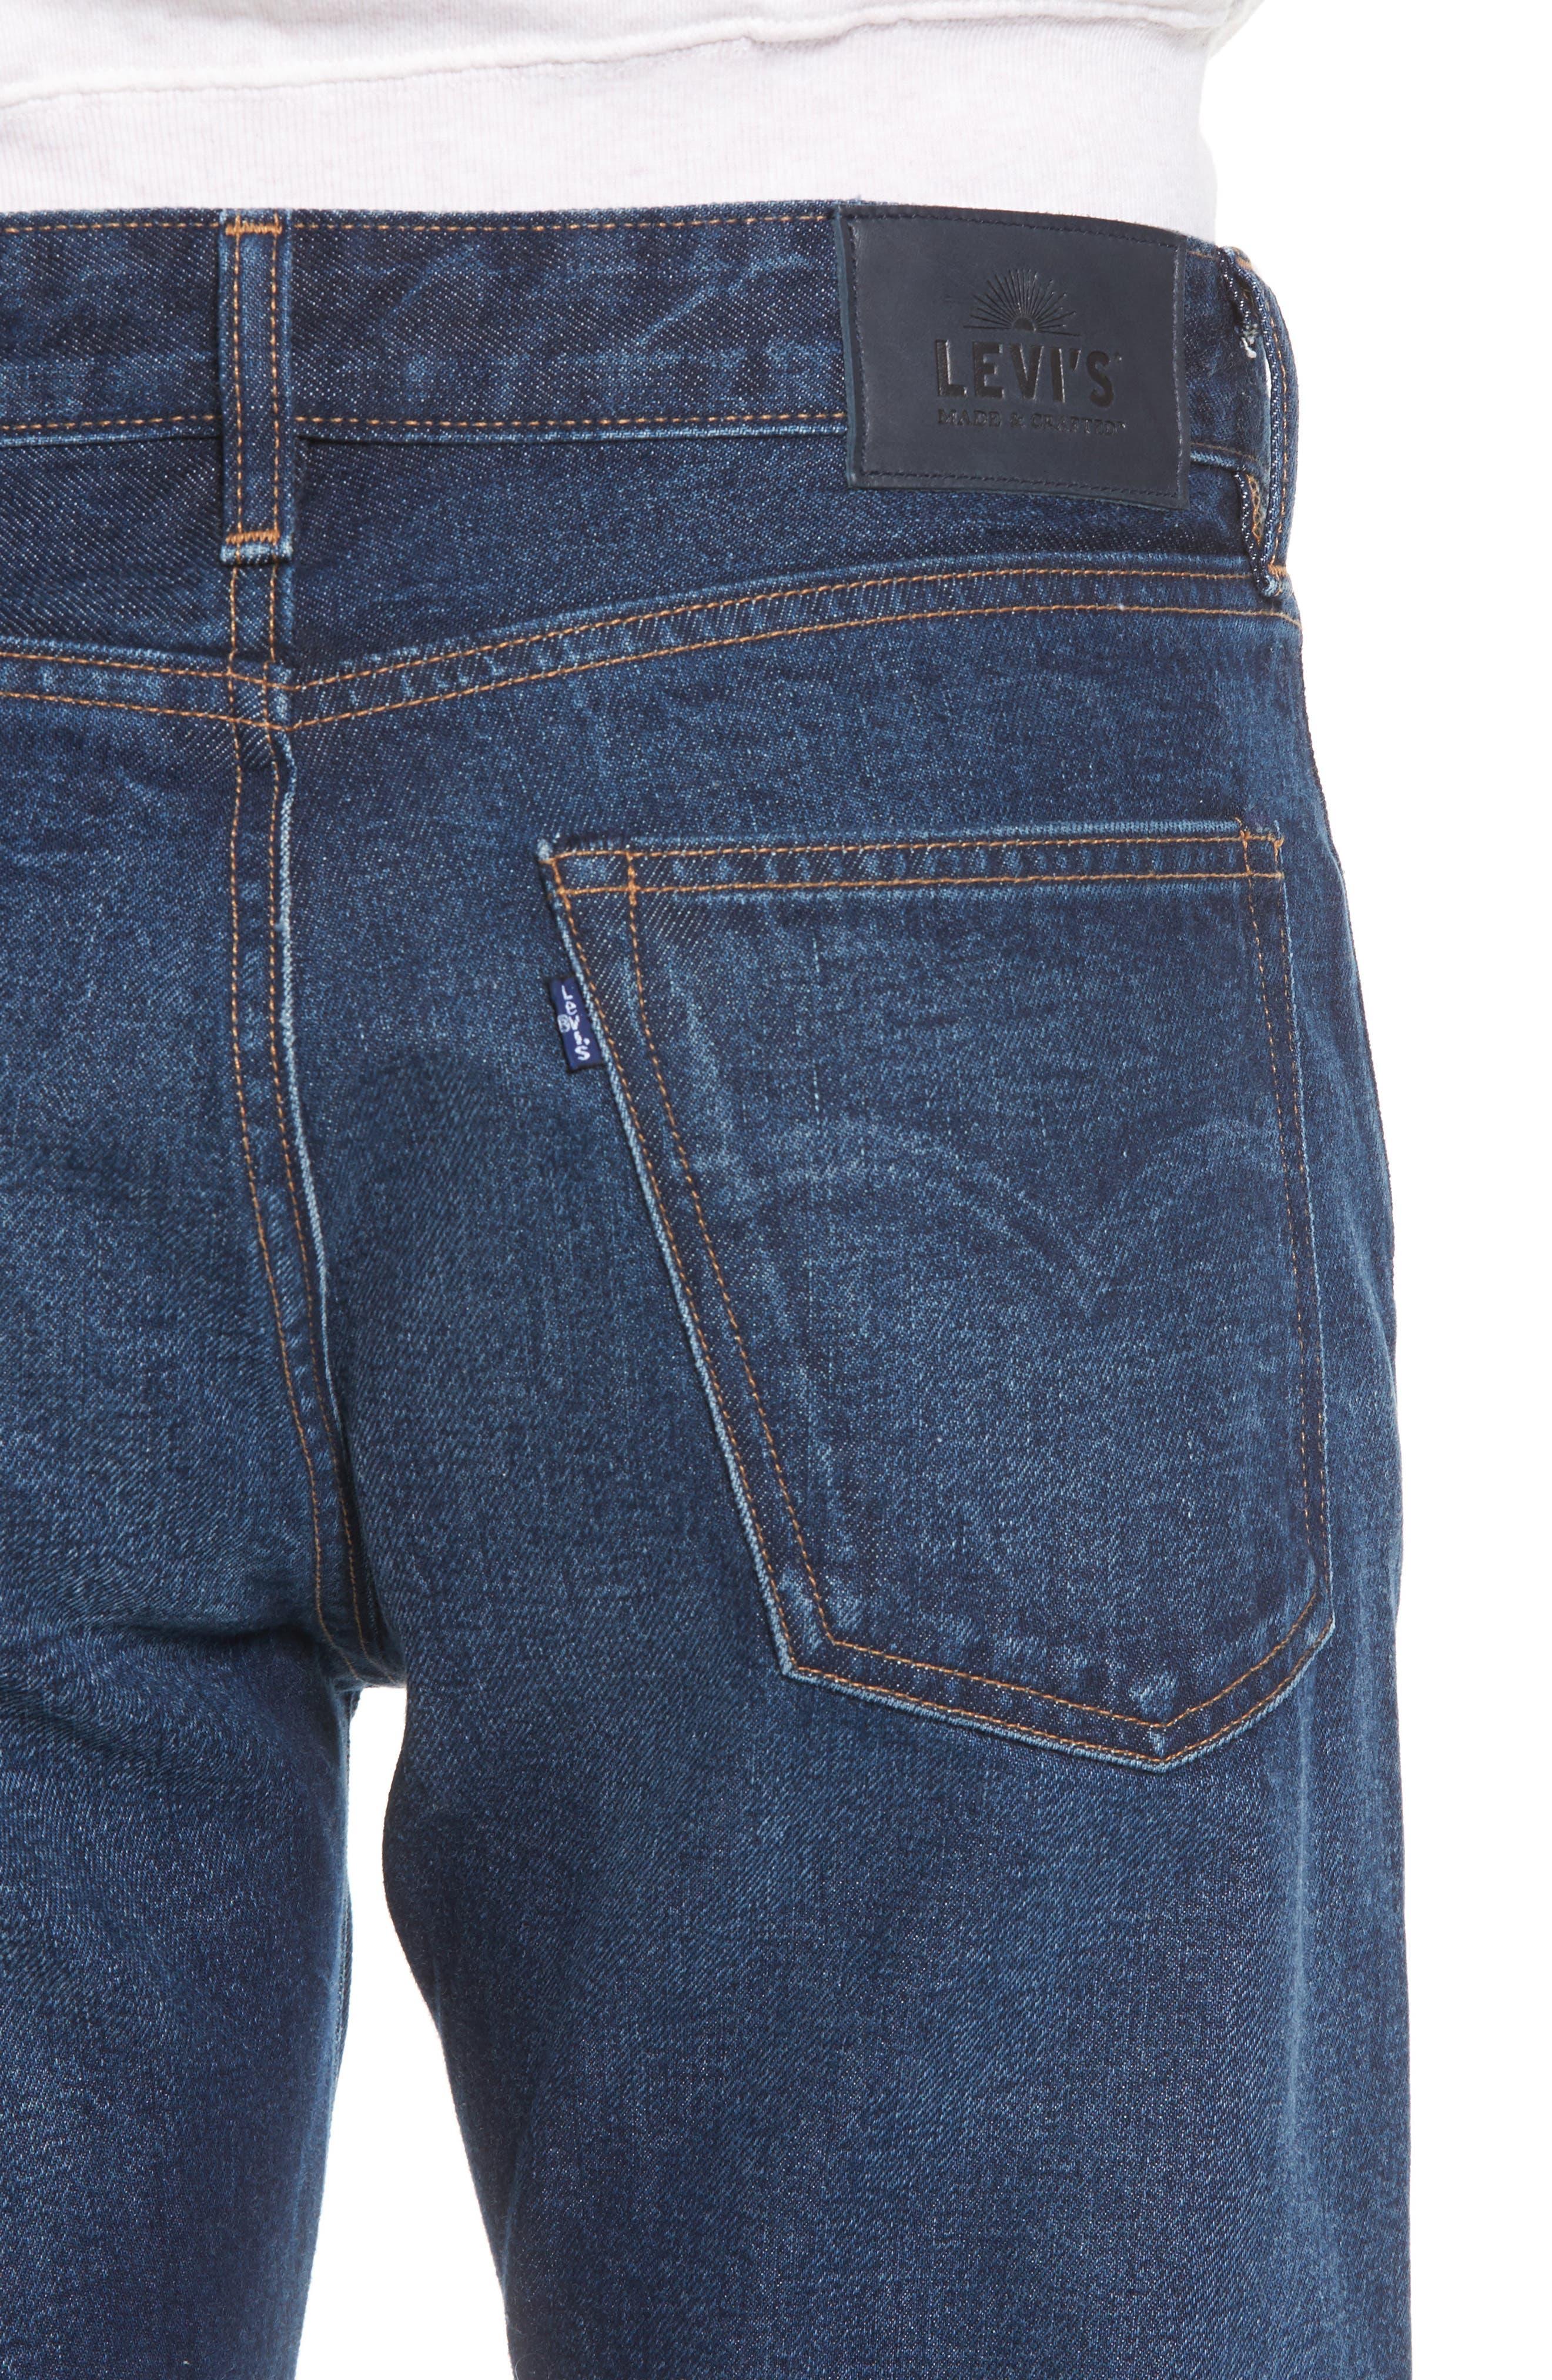 Tack Slim Fit Jeans,                             Alternate thumbnail 4, color,                             401